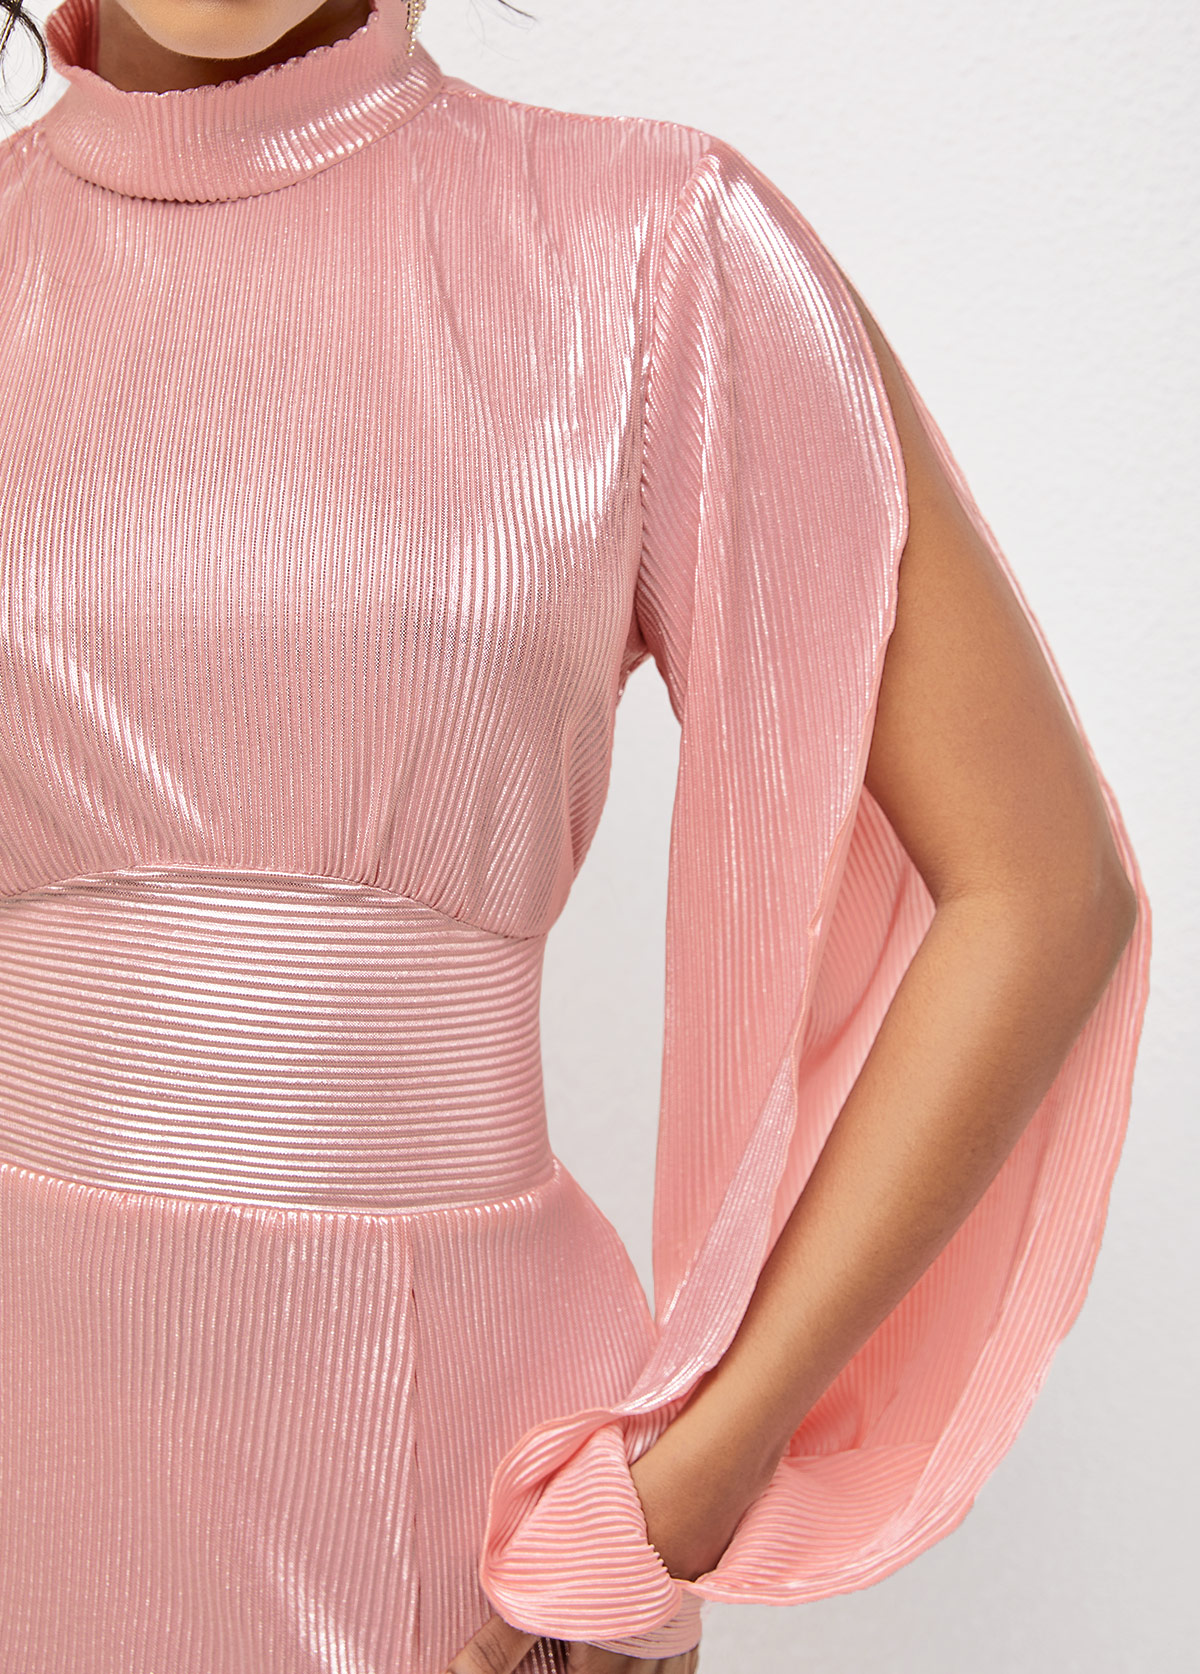 Cutout Detail Mock Neck Long Sleeve Dress